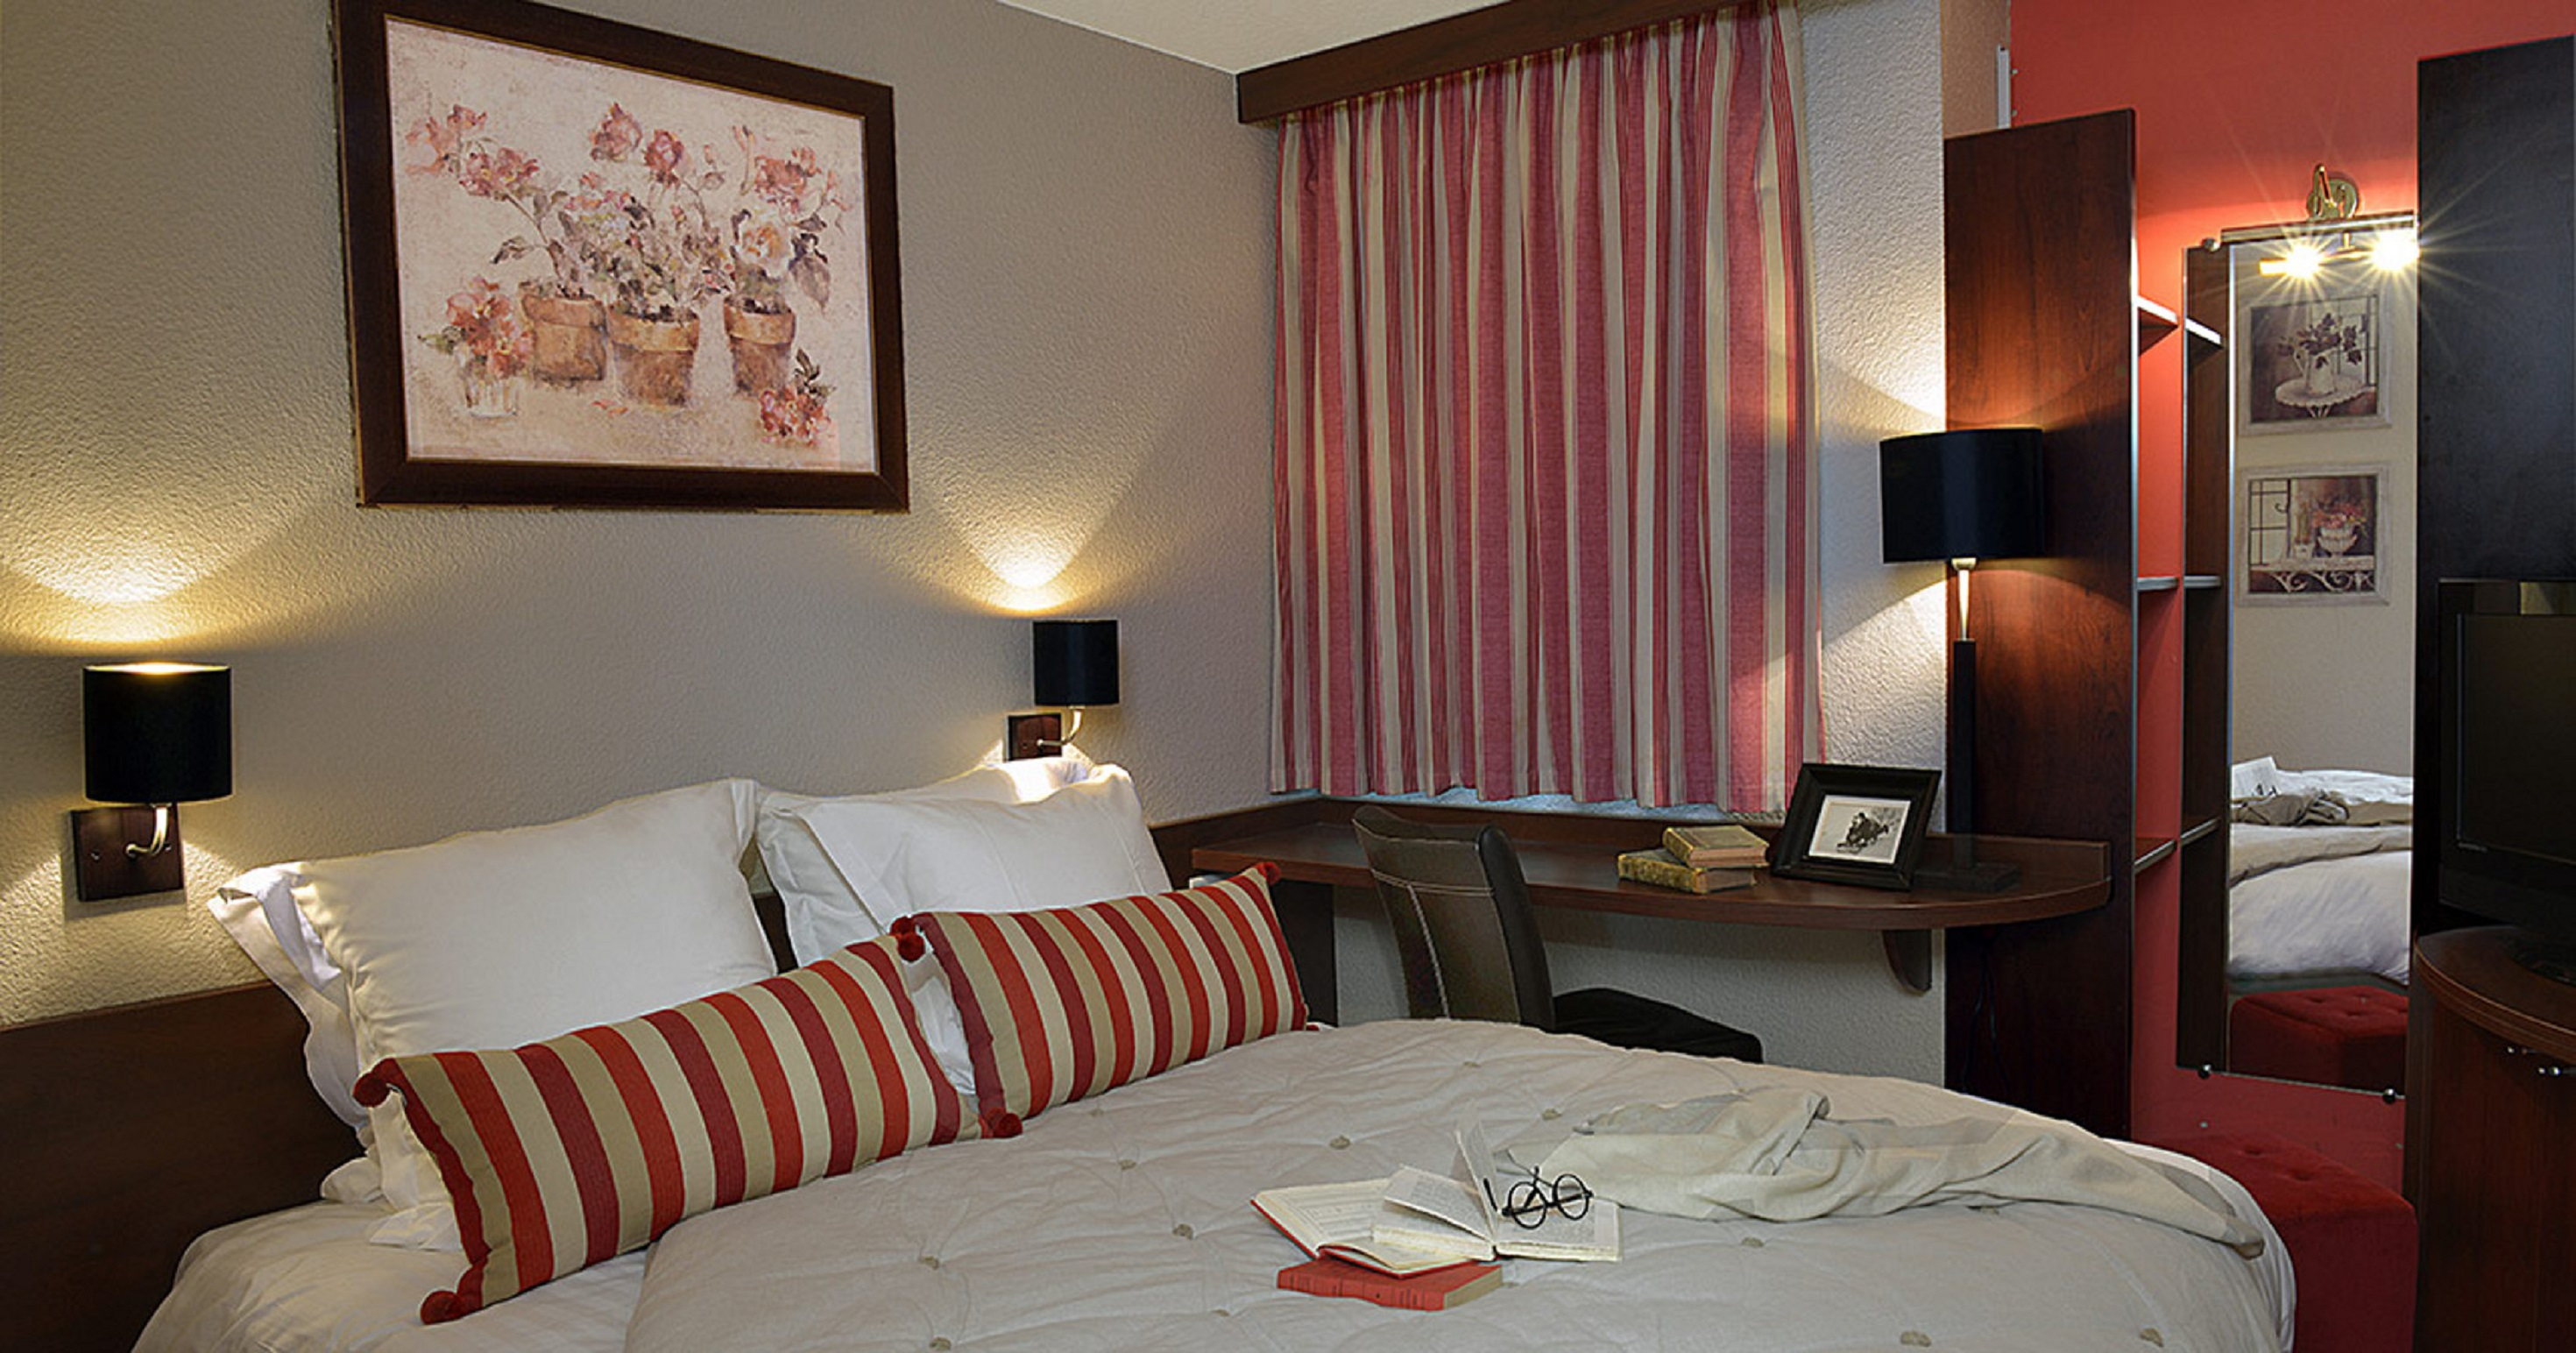 Hotel-Mercator-Chambre-Vendome©Hotel-Mercator-Eliophot